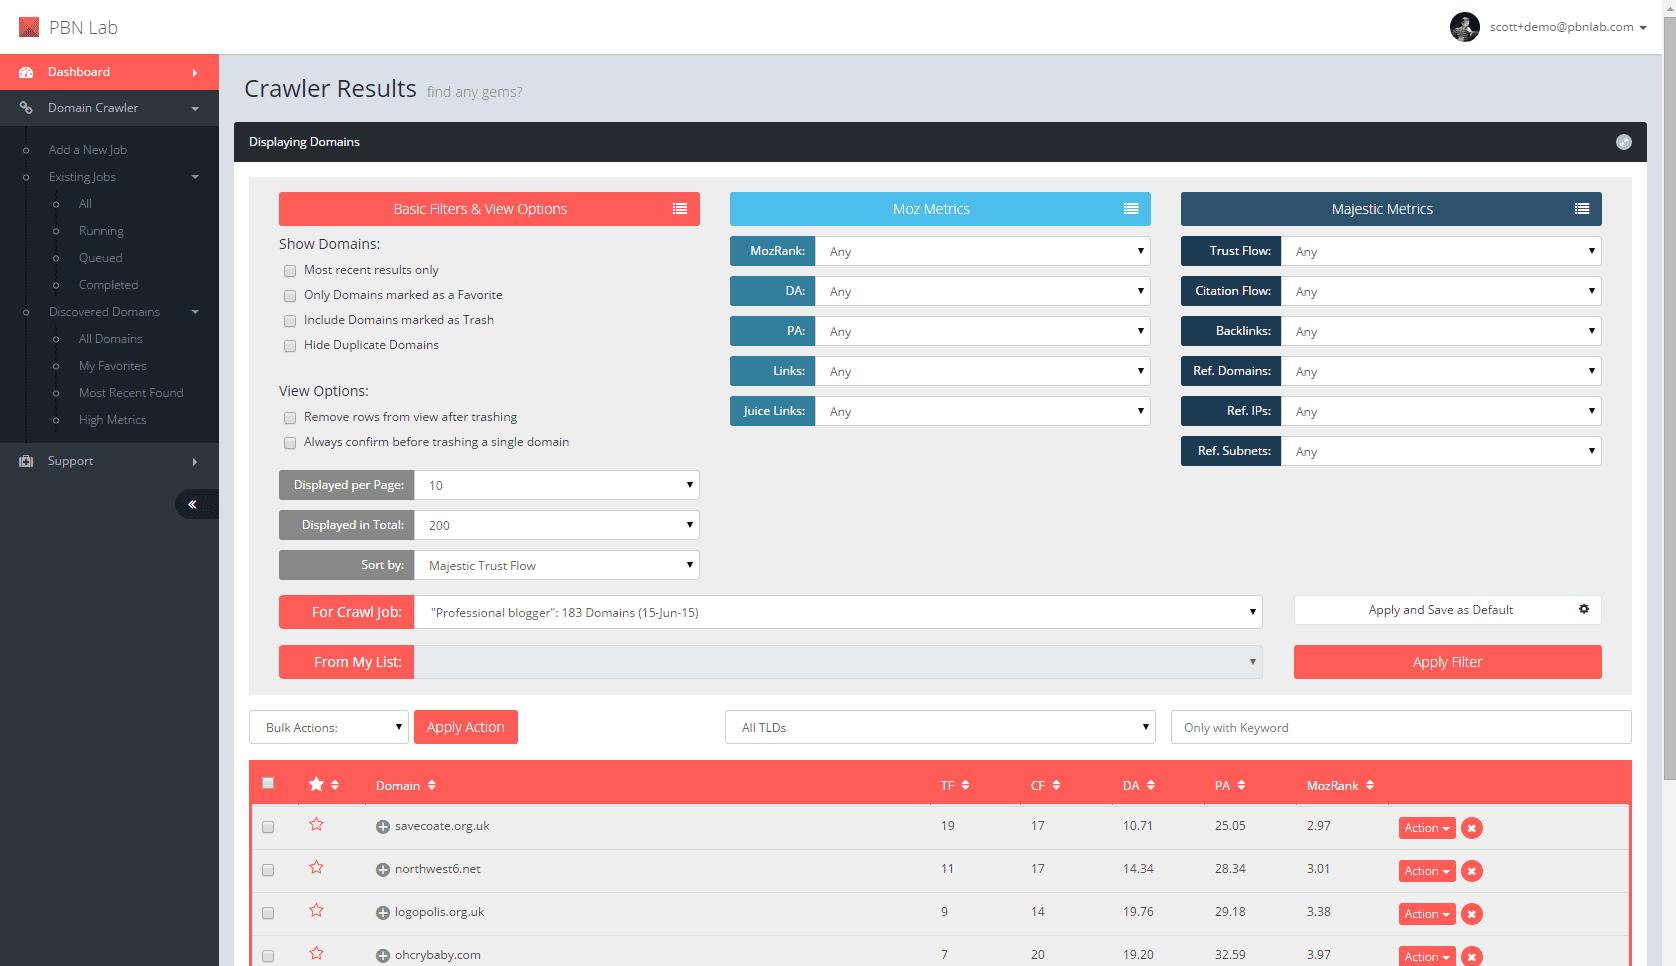 PBN-Lab-Expired-Domain-Crawler_4_Advanced-Filtering